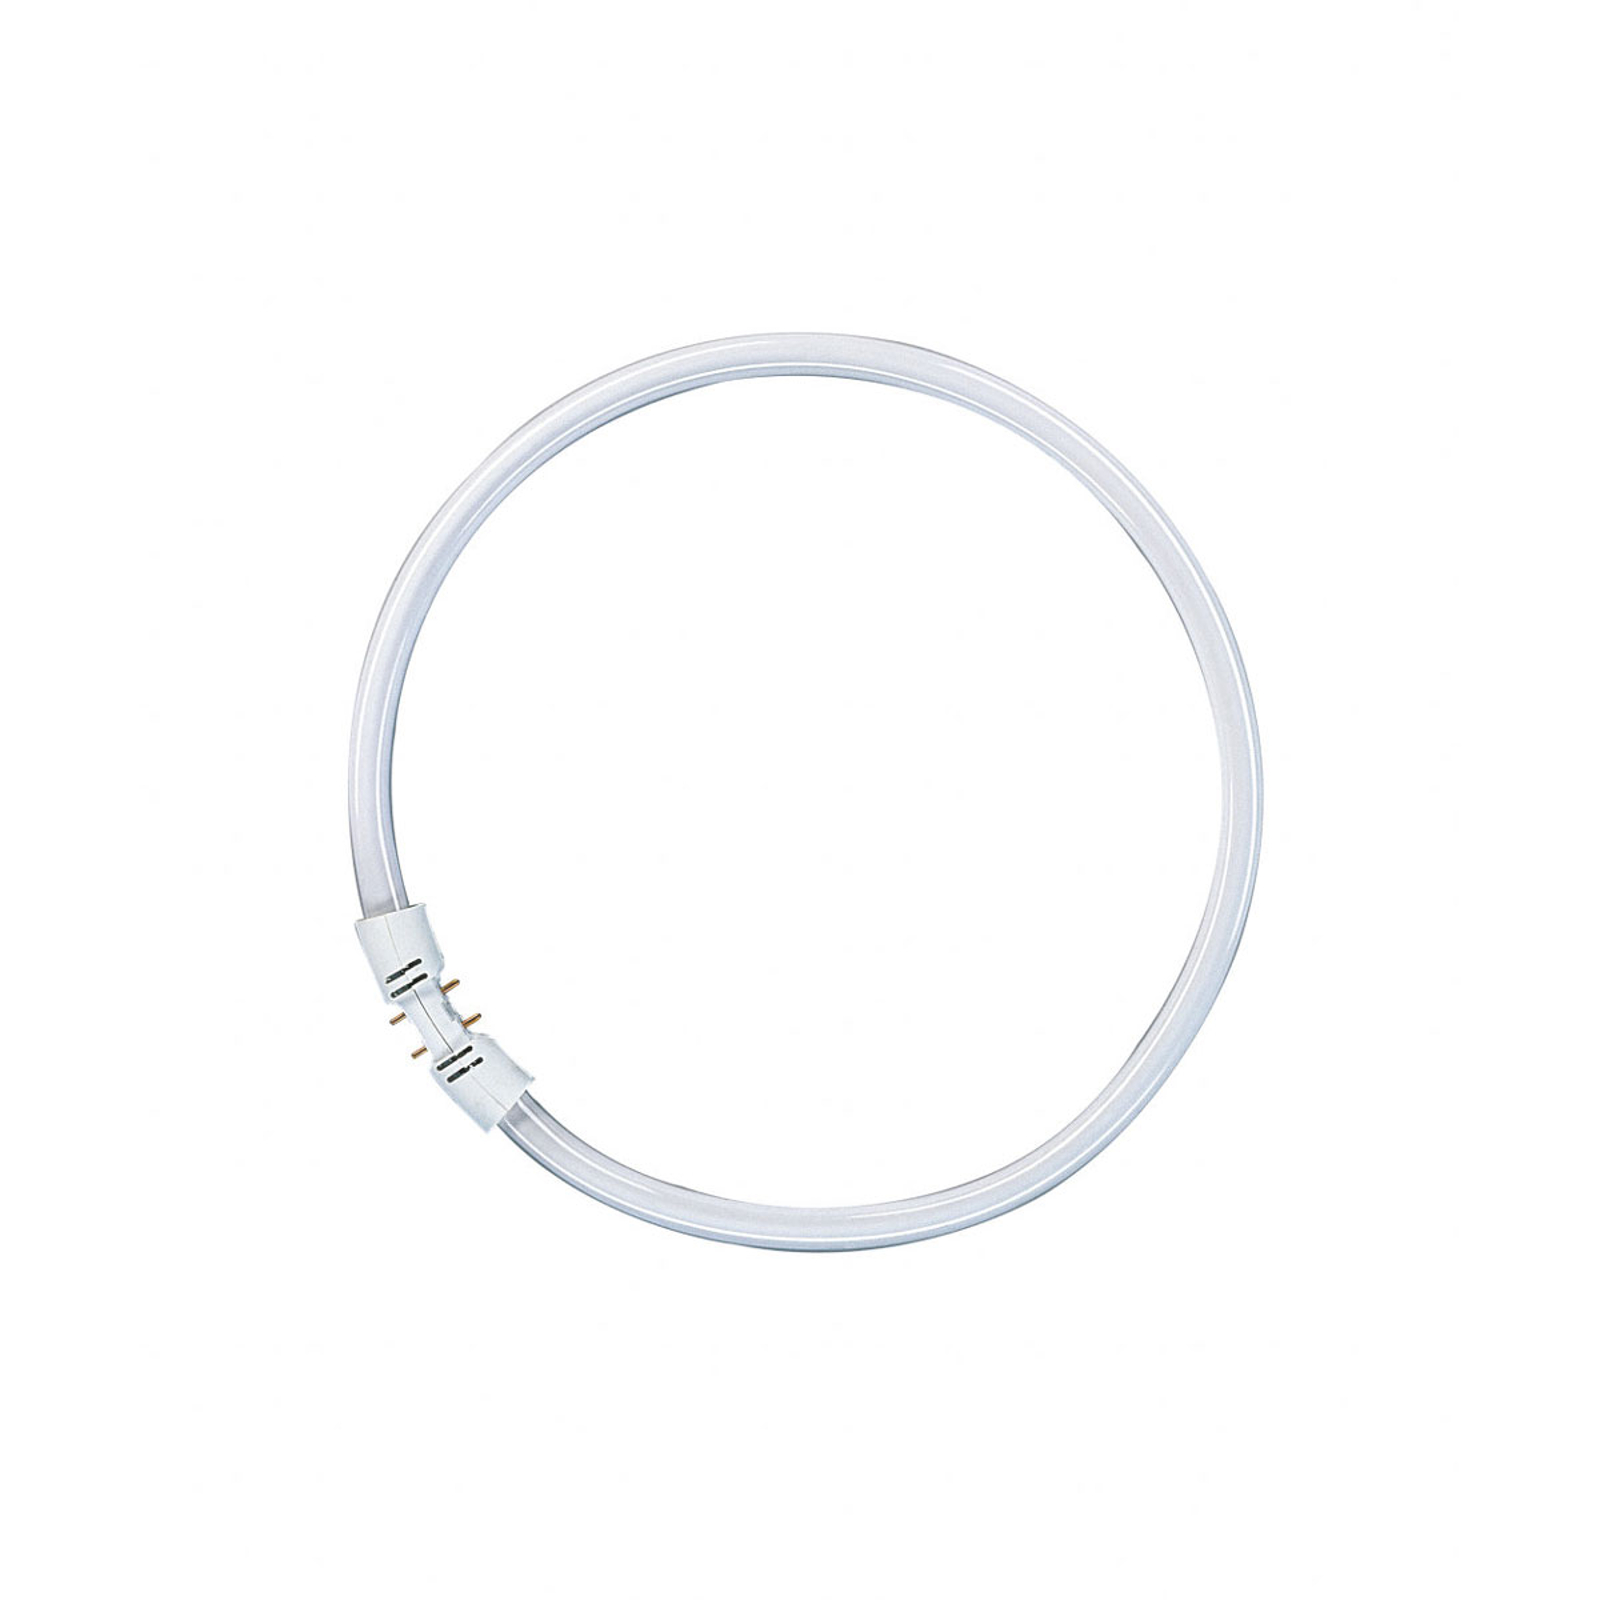 2Gx13 LUMILUX T5 Ring-lysstoffpære 22W 830